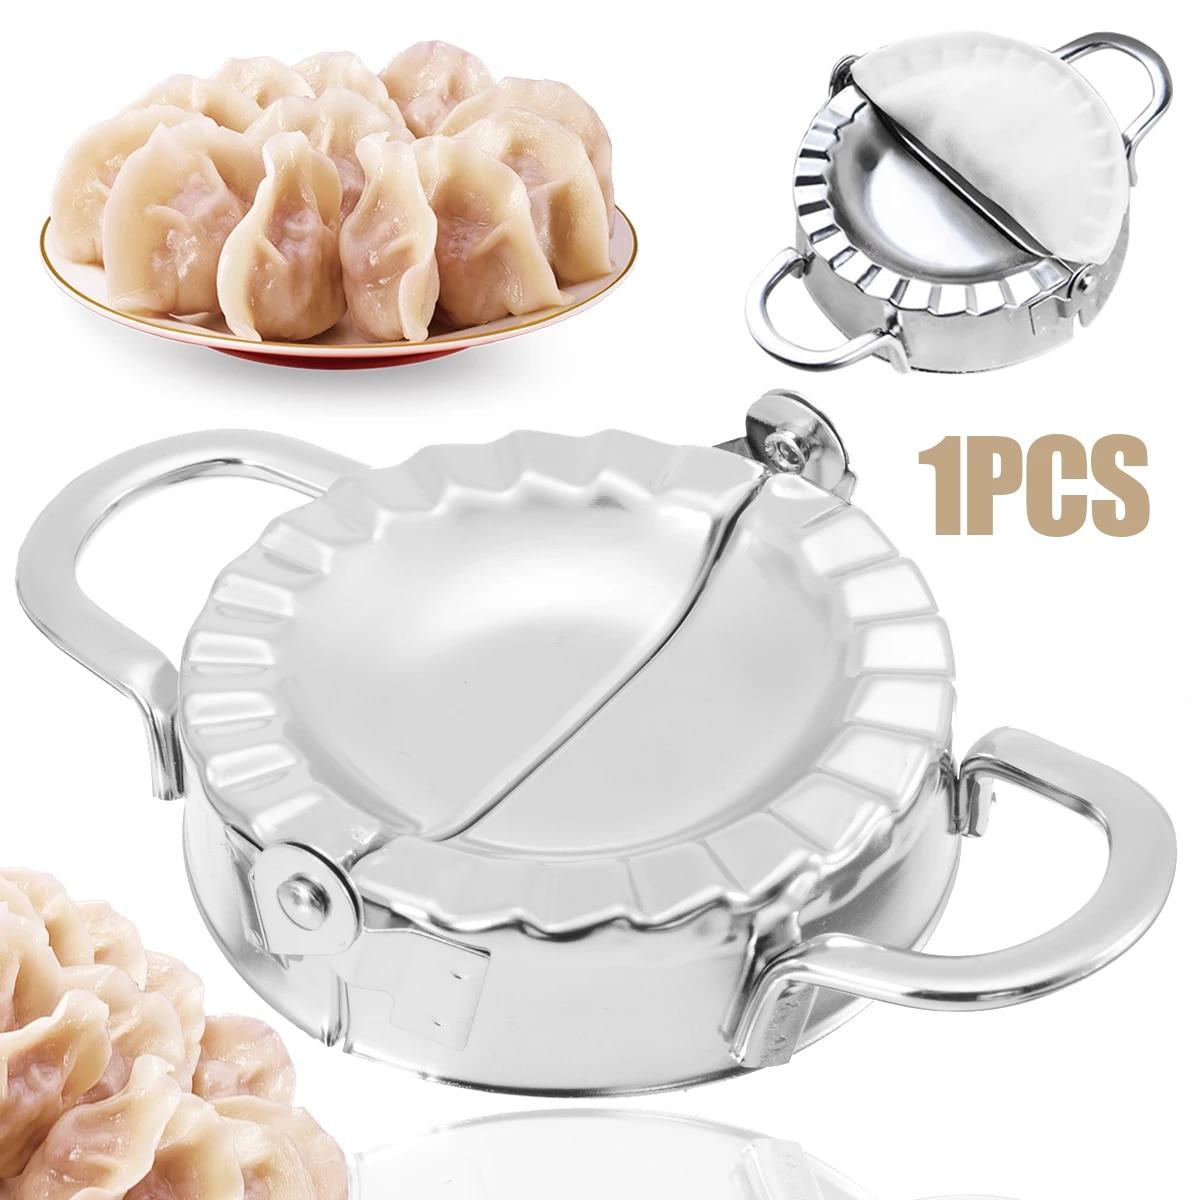 Stainless Steel Dumpling Maker Machine Wraper Dough Cutter Eco-Friendly Tool Set